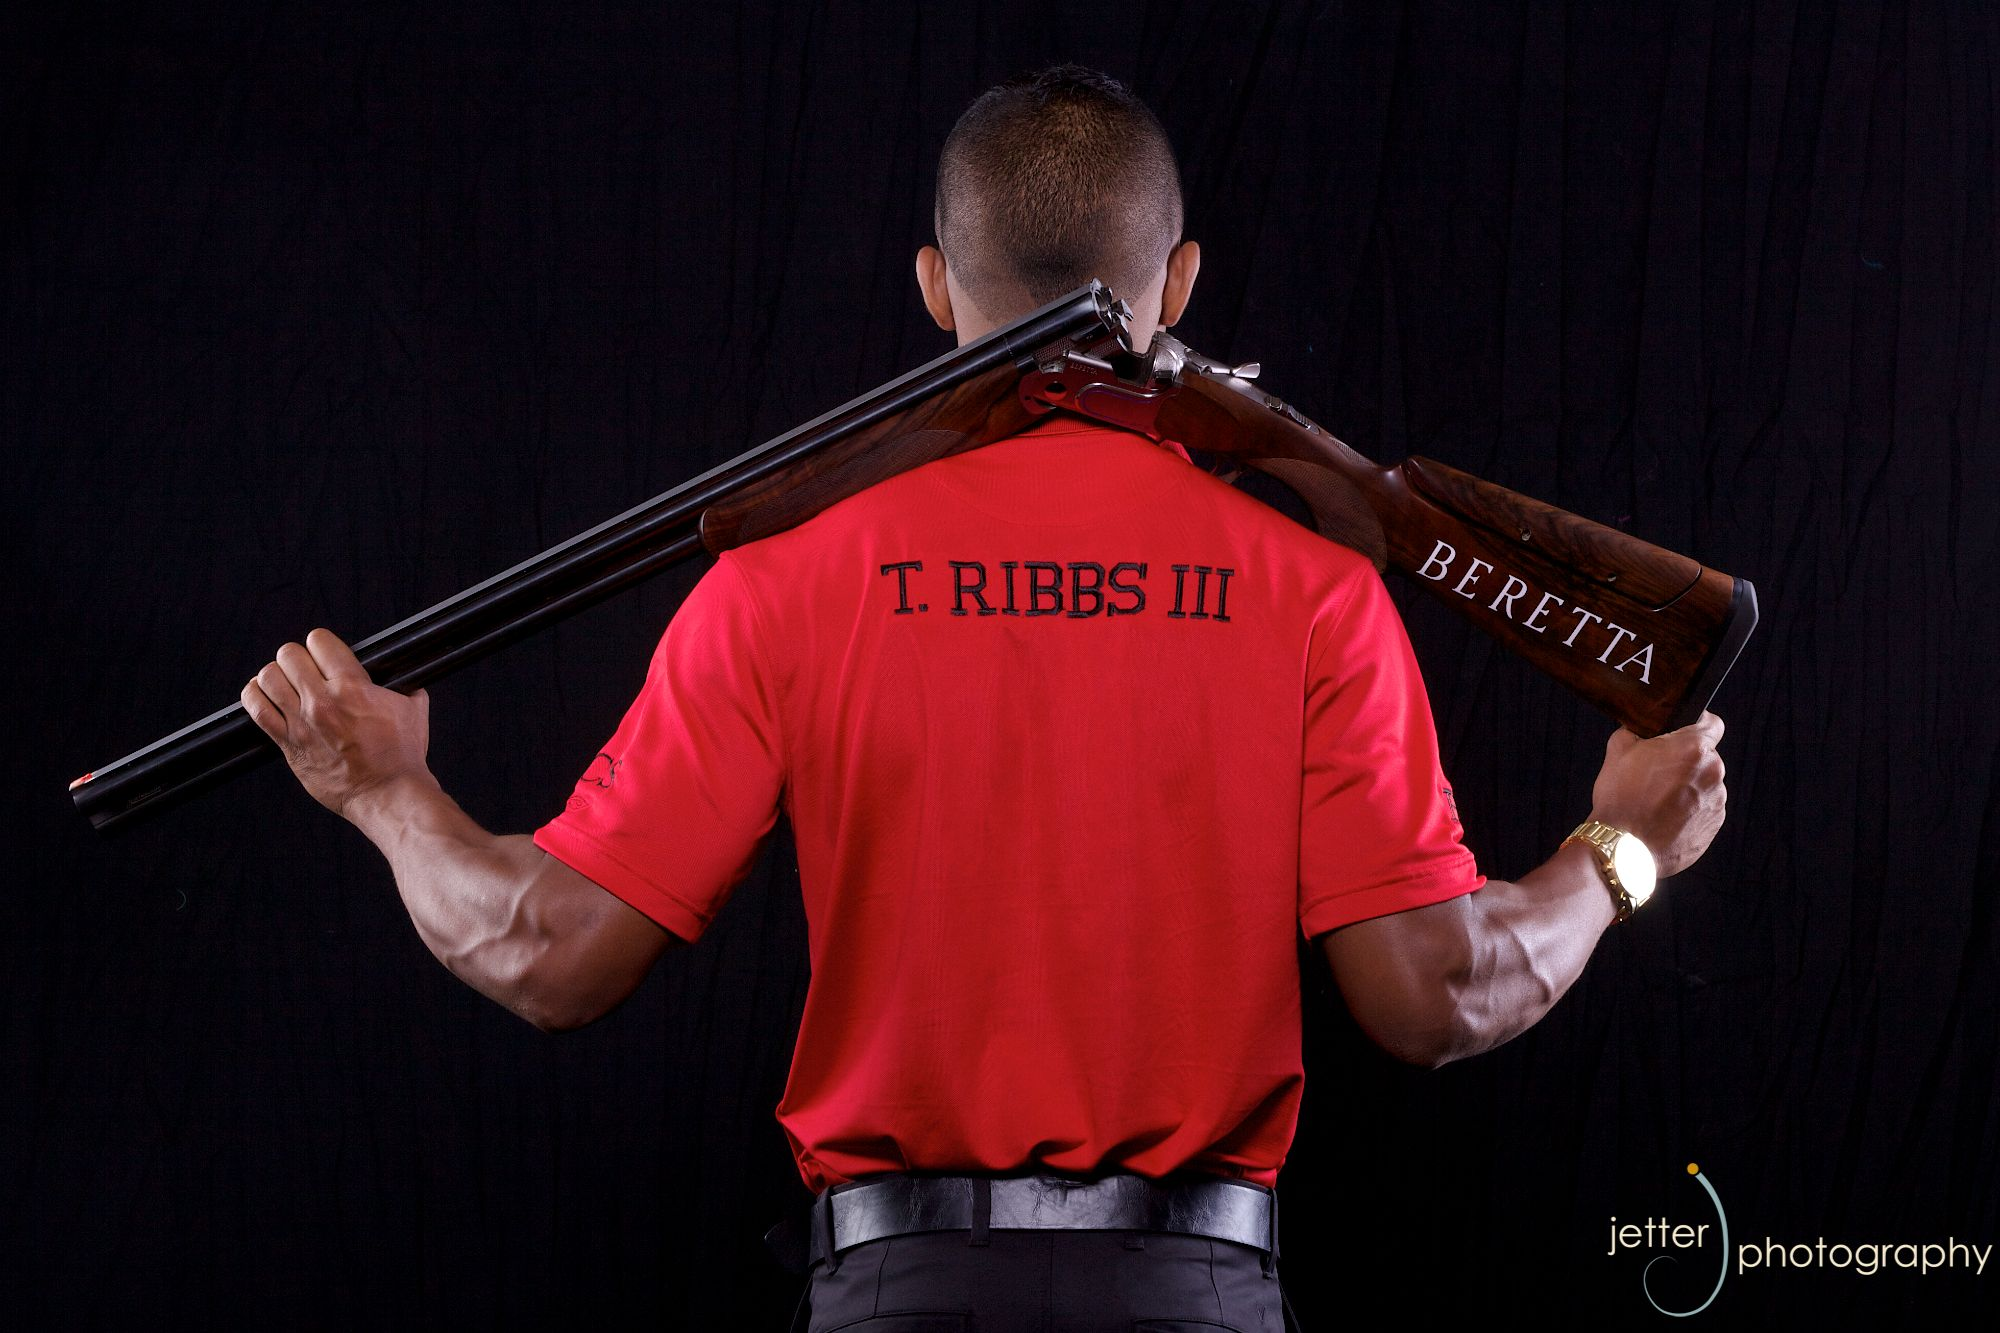 theo-ribbs 13